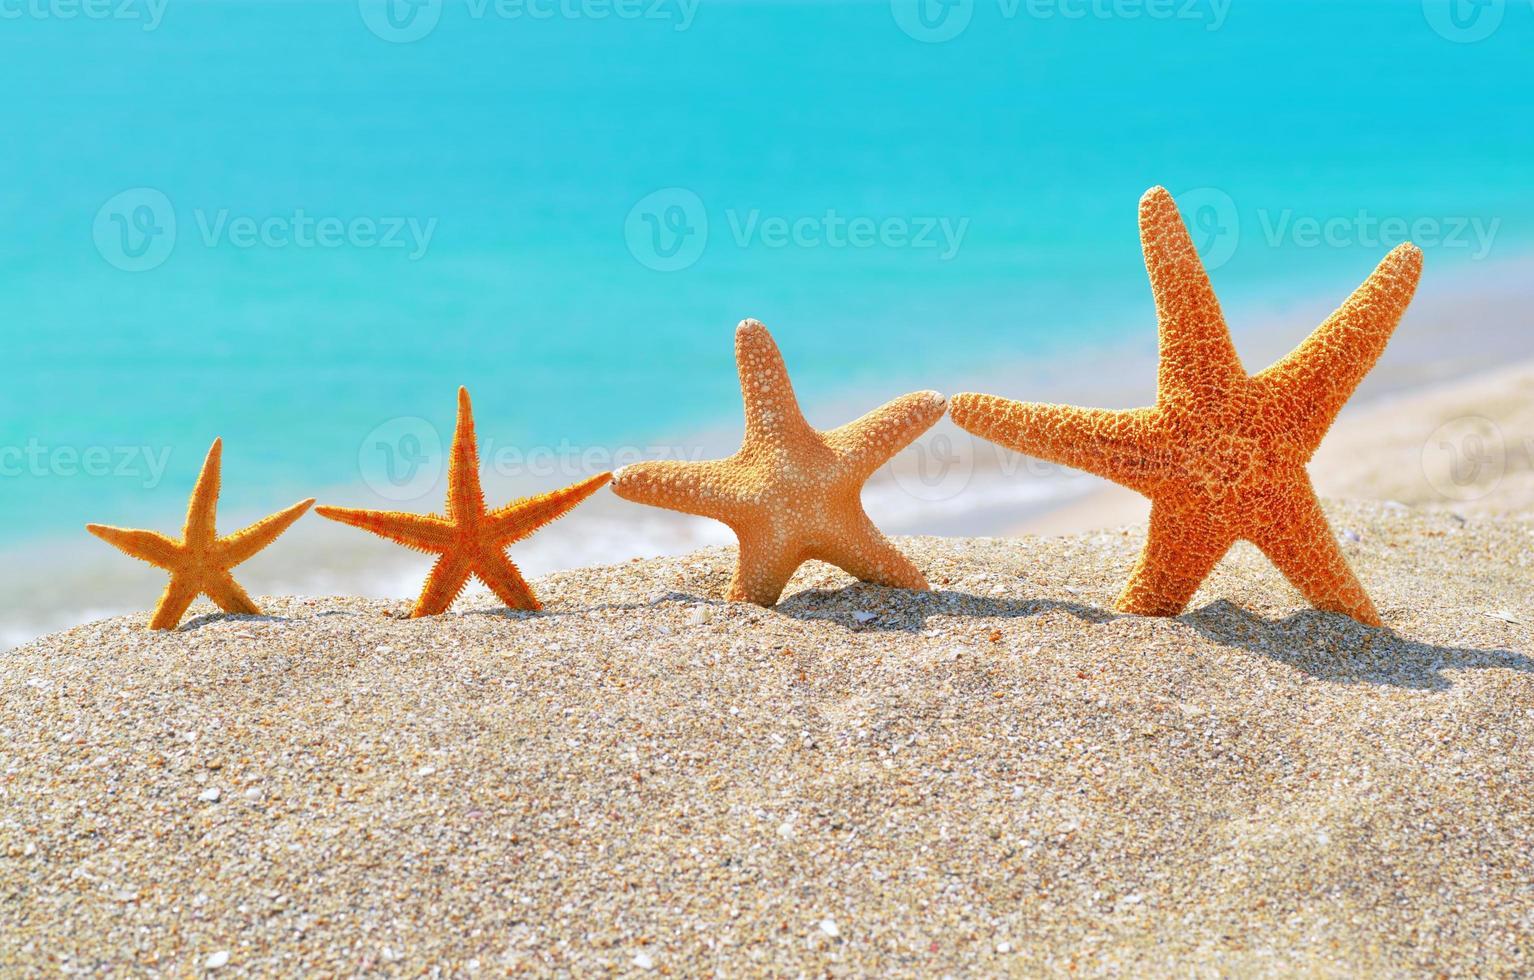 Starfishes on the beach photo